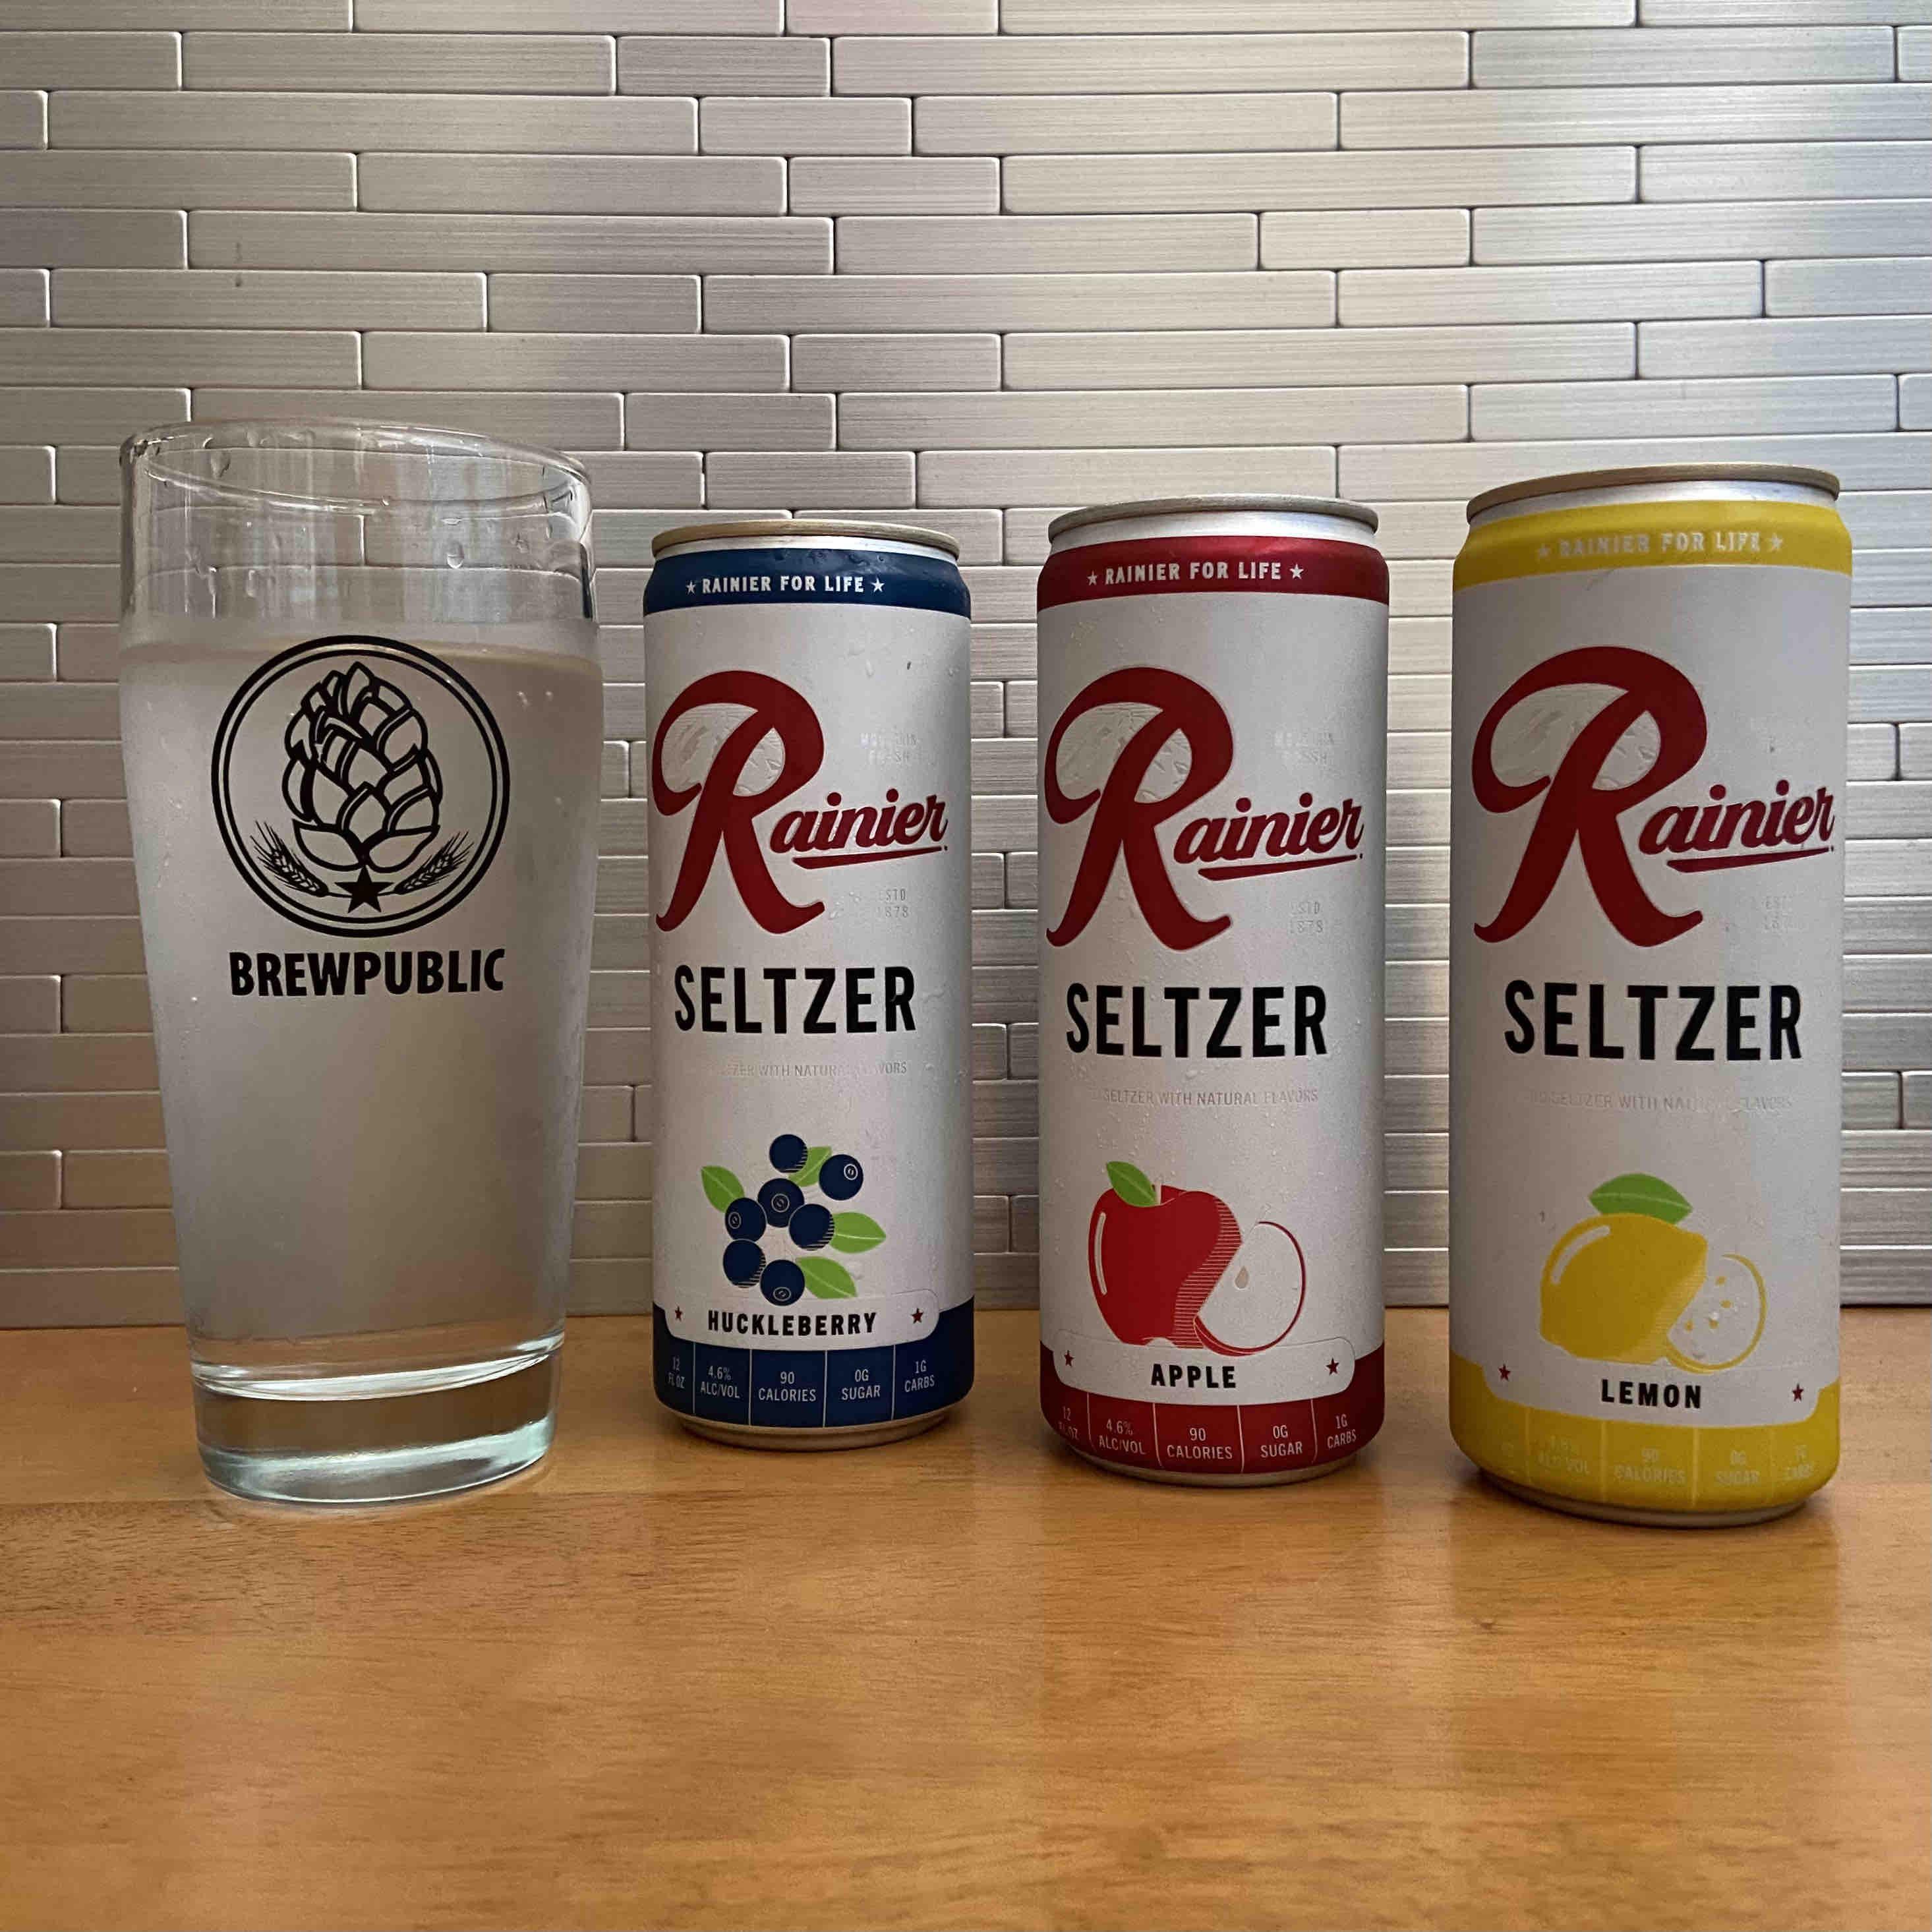 Rainier Hard Seltzer in Huckleberry, Apple, and Lemon flavors.